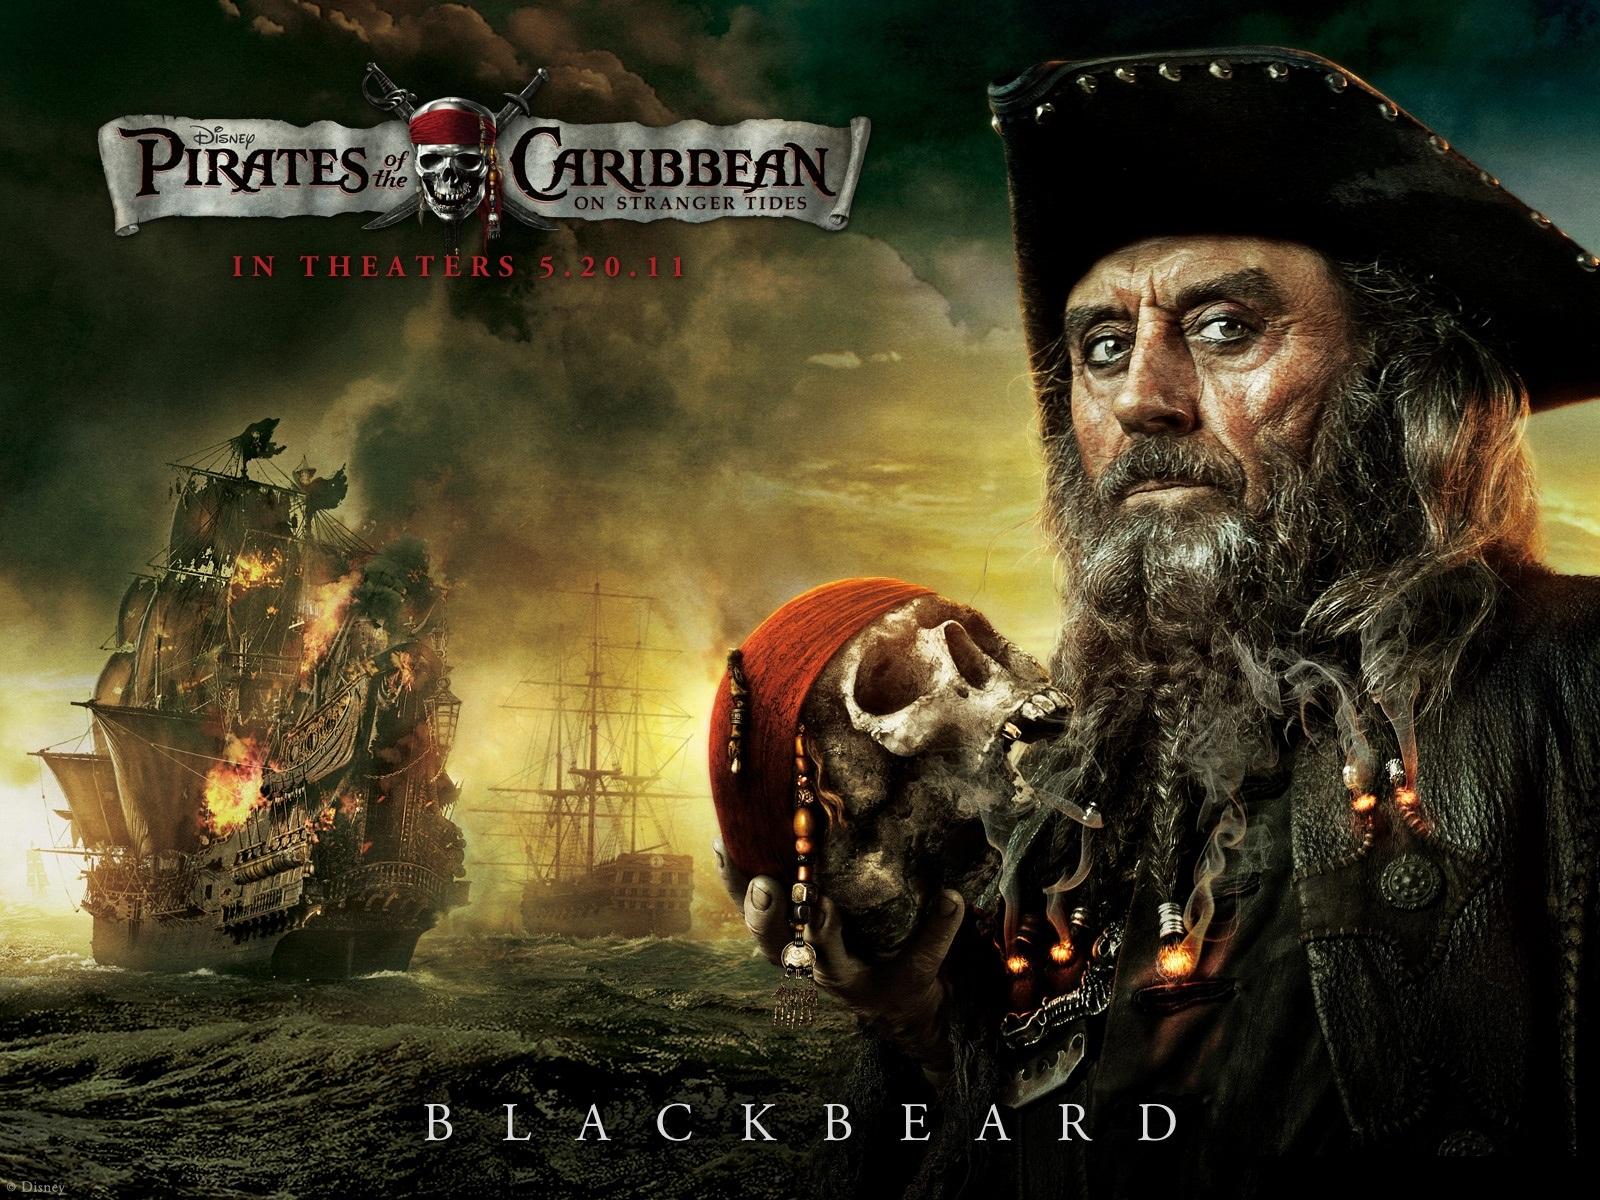 Blackbeard 2011 Pirates Of The Caribbean On Stranger - Pirate Of Caribbean 4 , HD Wallpaper & Backgrounds